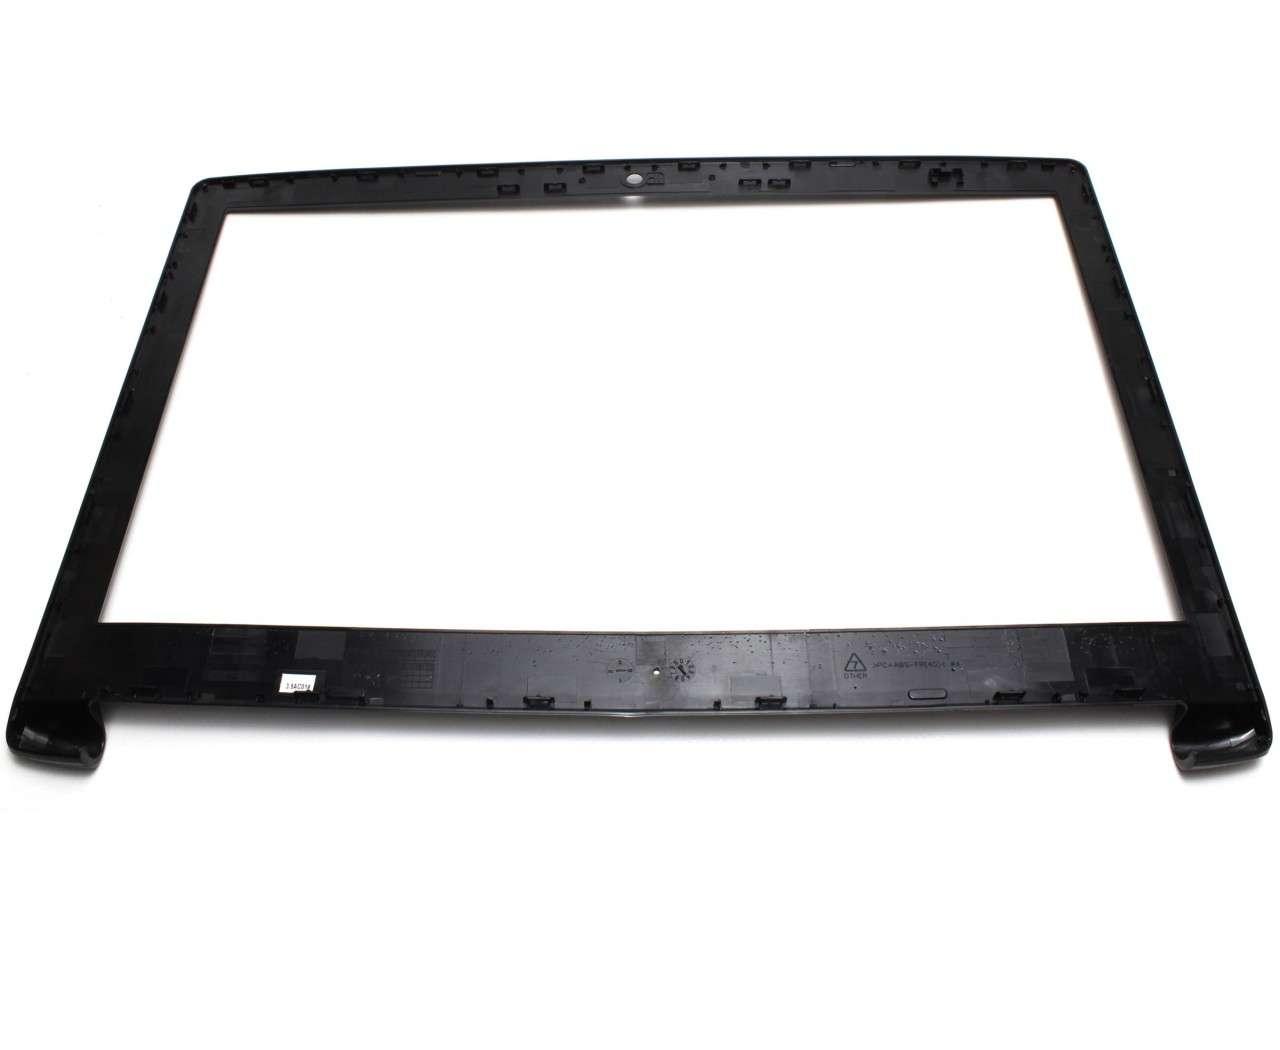 Rama Display Acer Aspire 5 A515-41G Bezel Front Cover Neagra imagine powerlaptop.ro 2021